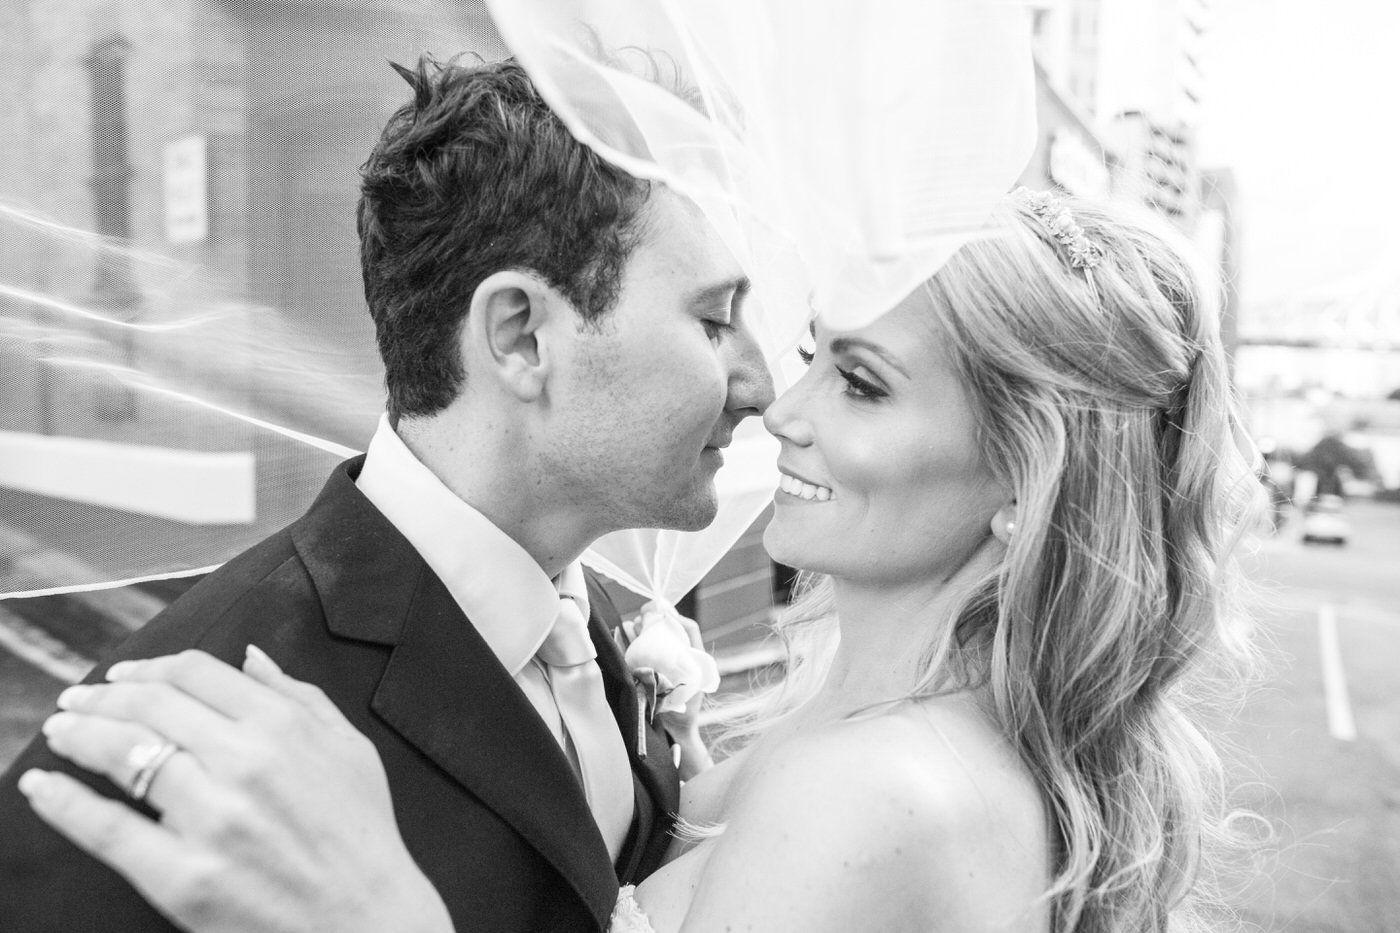 proposal ideas, engaged, engagament, wedding ideas